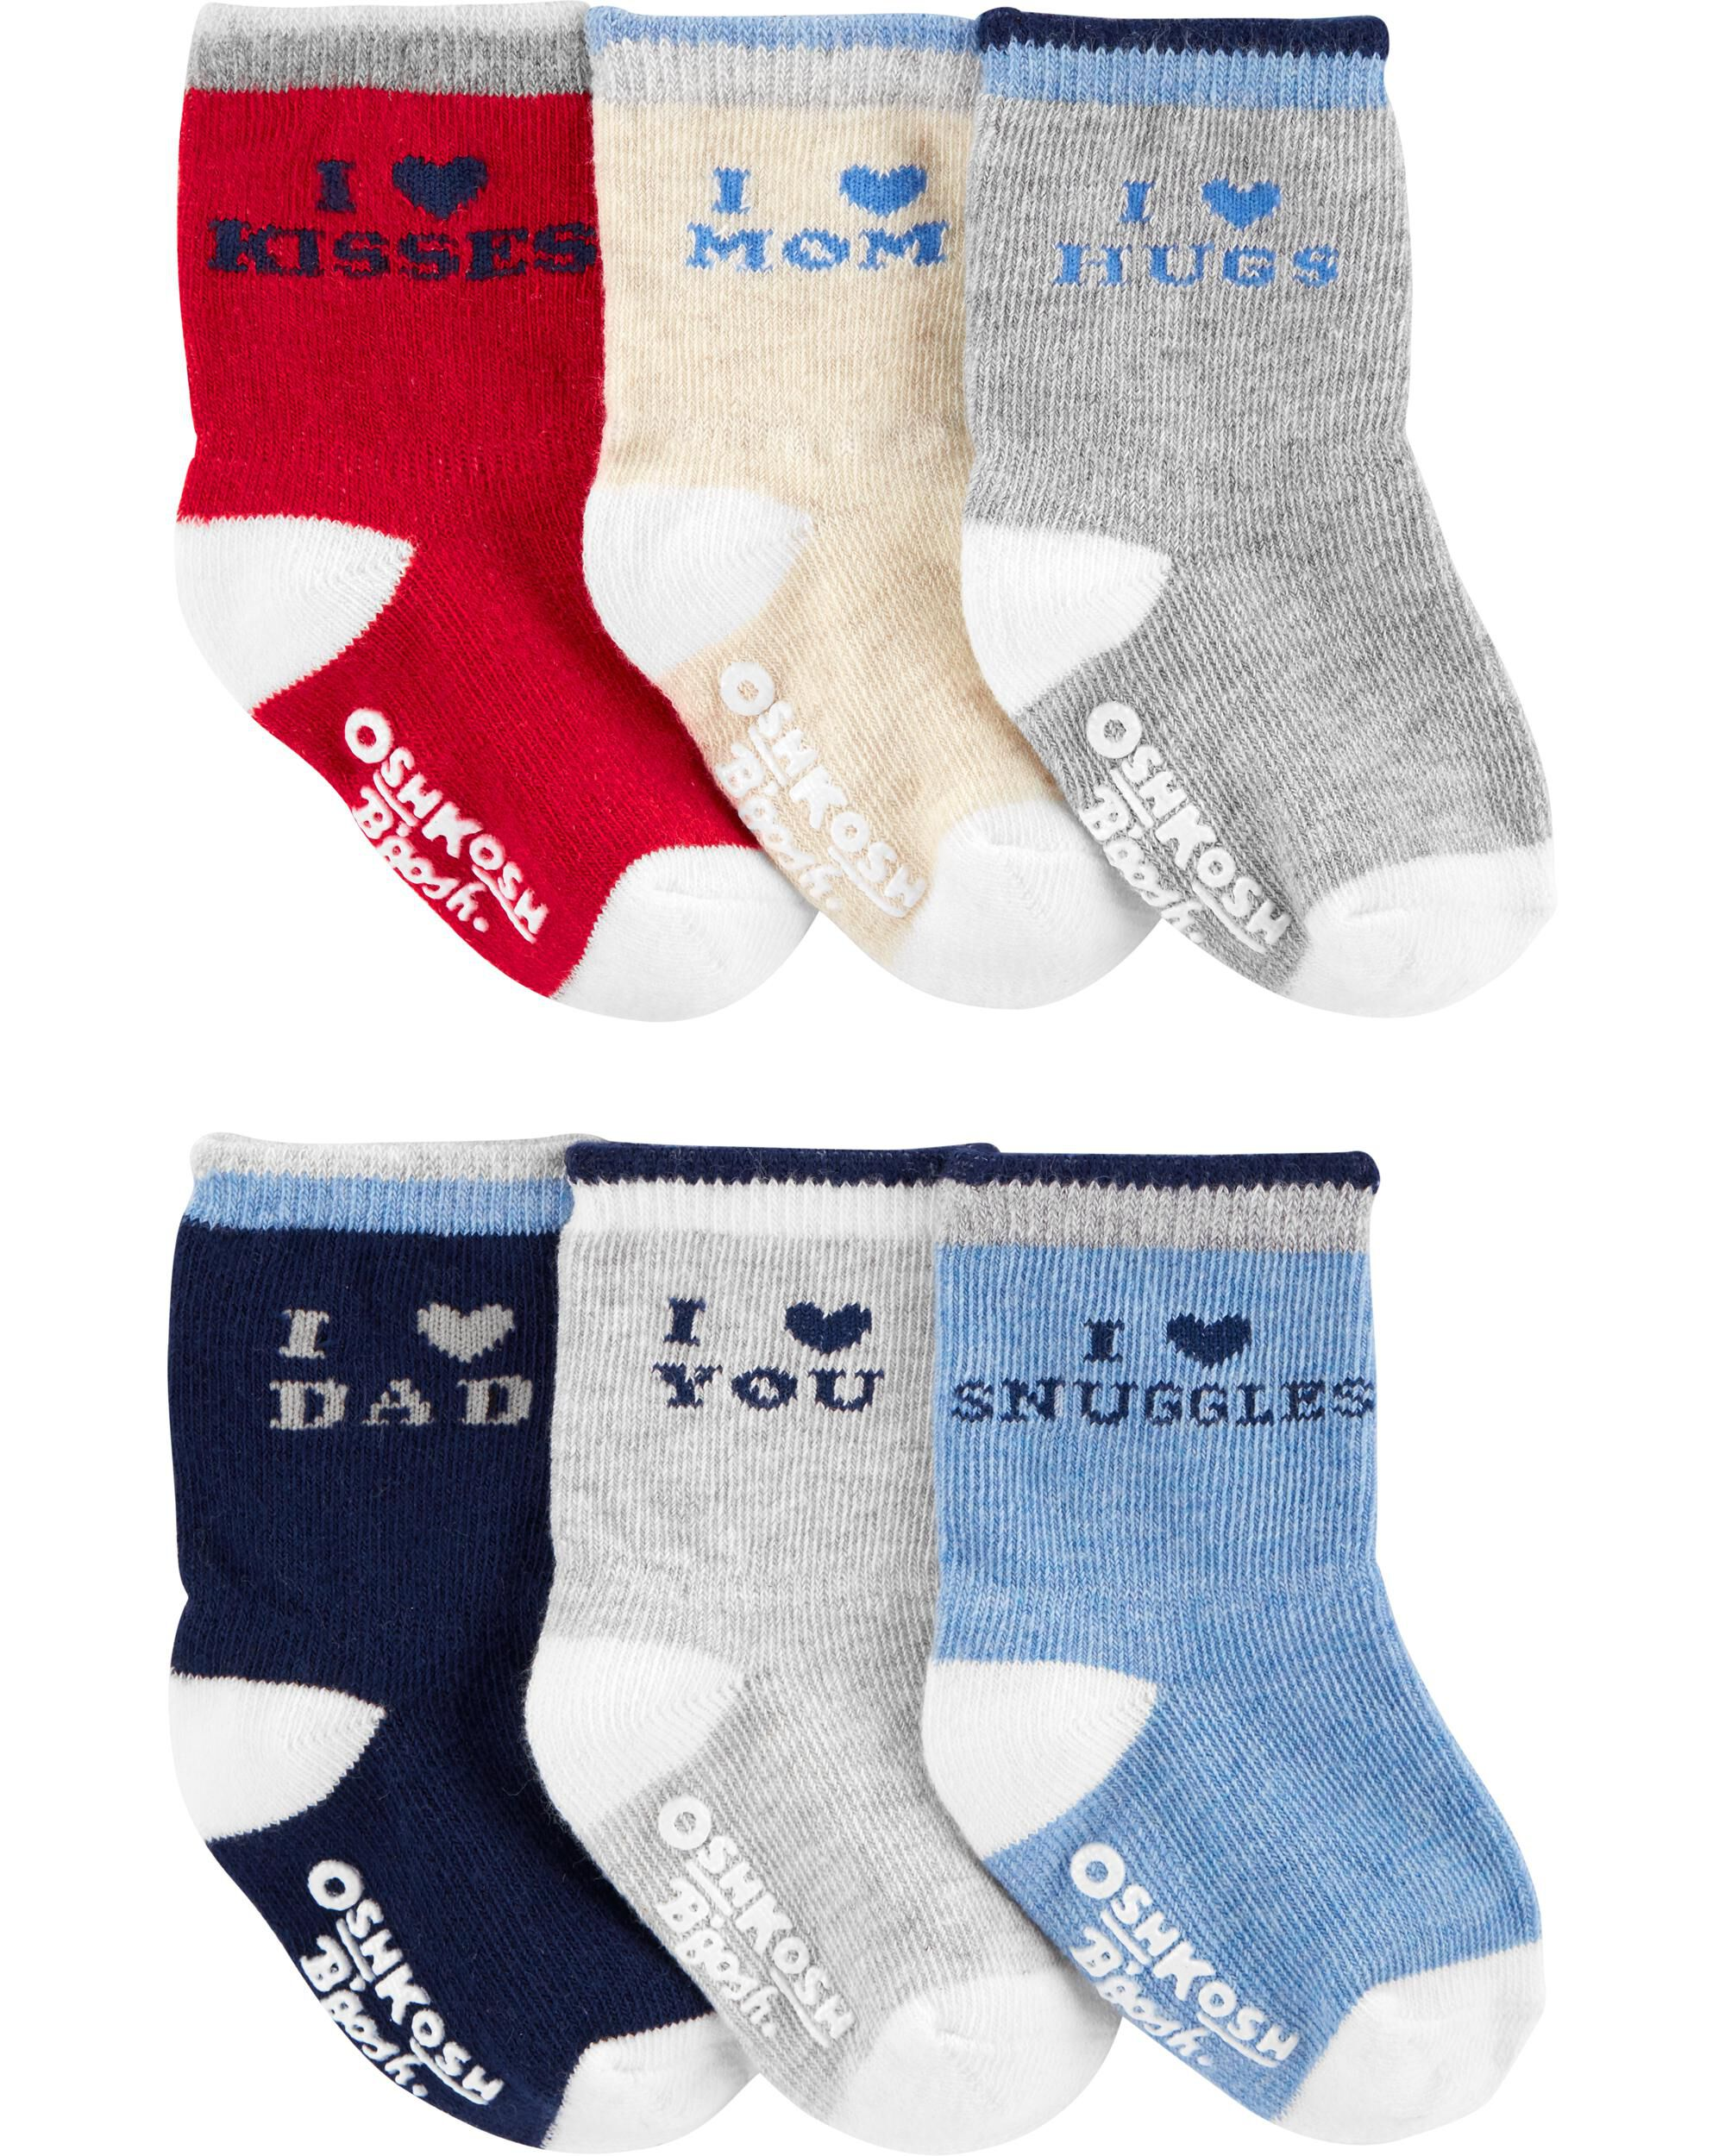 OshKosh BGosh Baby Boys Crew Socks 3-12 Months Days of The Week//Beach 7 Pack